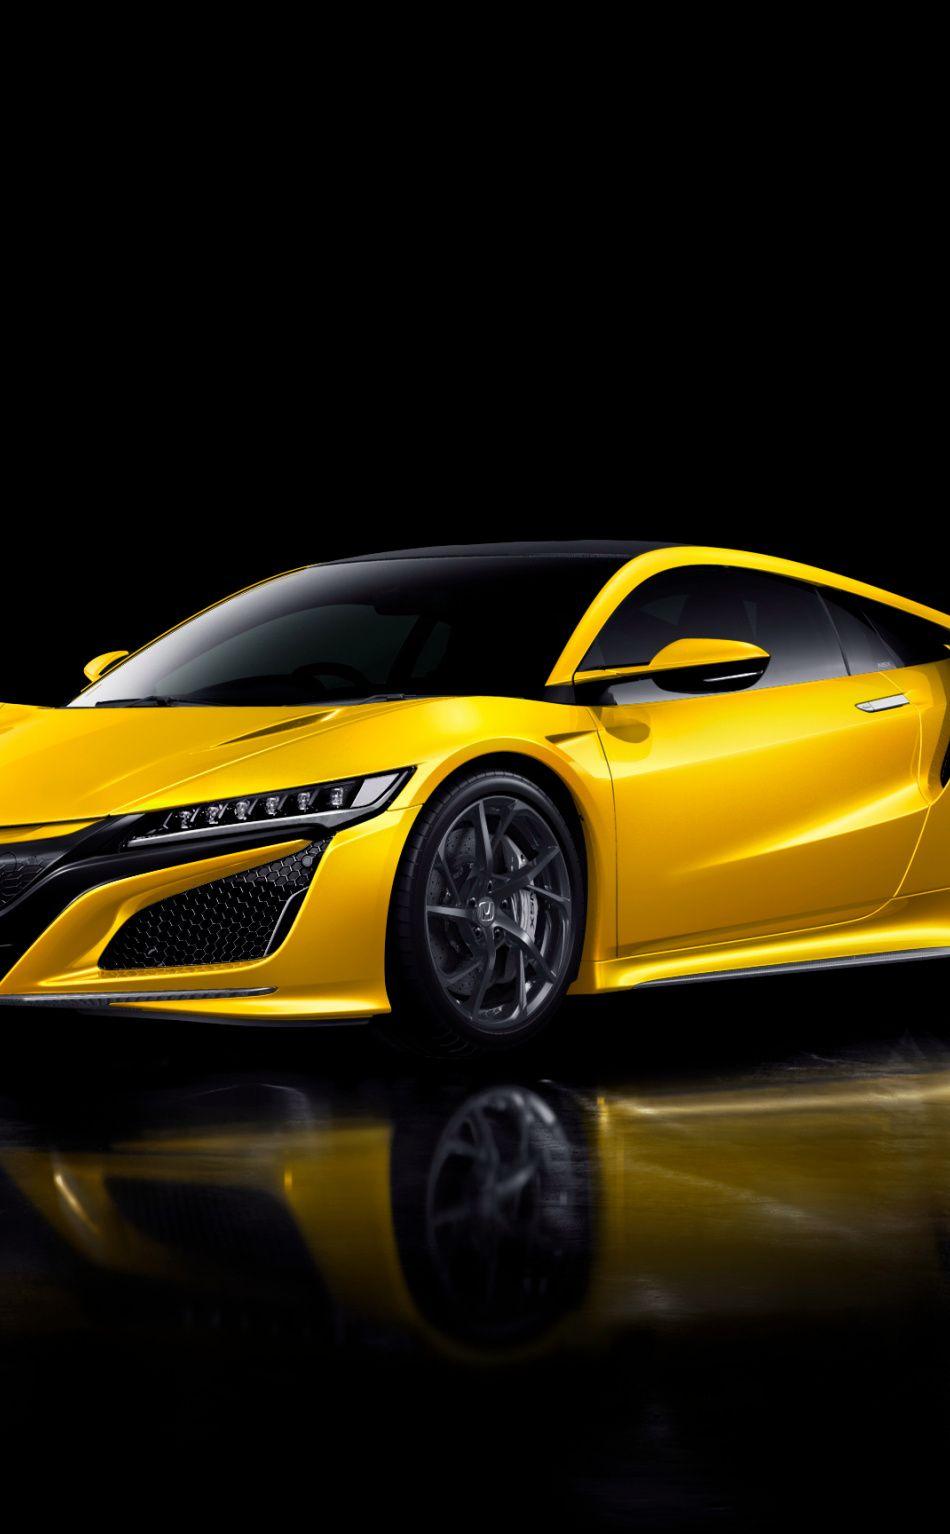 950x1534 Car Honda Nsx Yellow Car Wallpaper Yellow Car Nsx Car